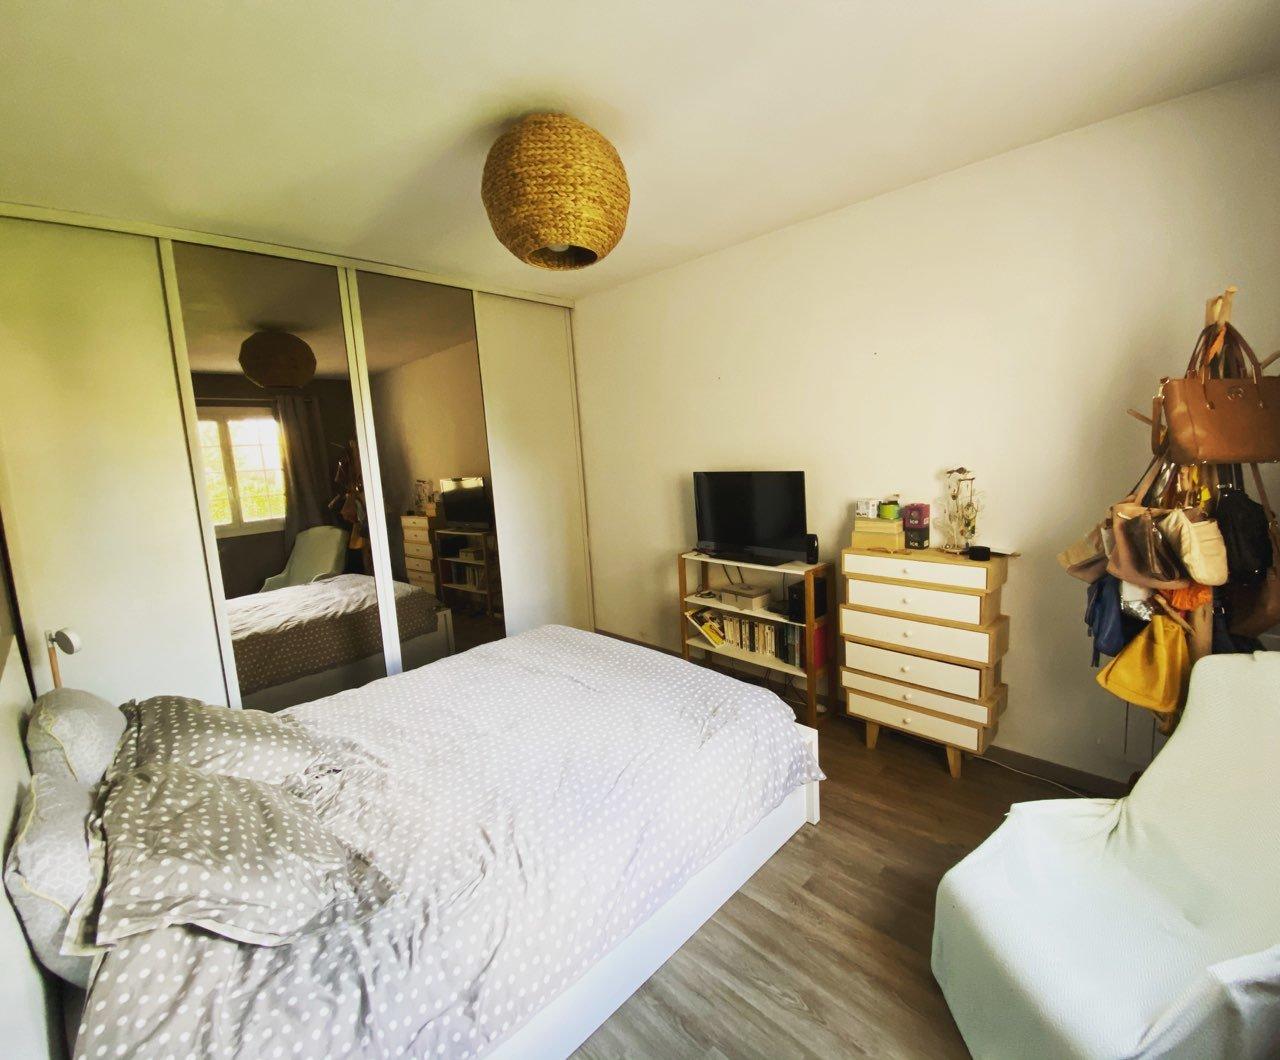 PEYMEINADE, Appartement 4 Pièces, 3 chambres, Parking